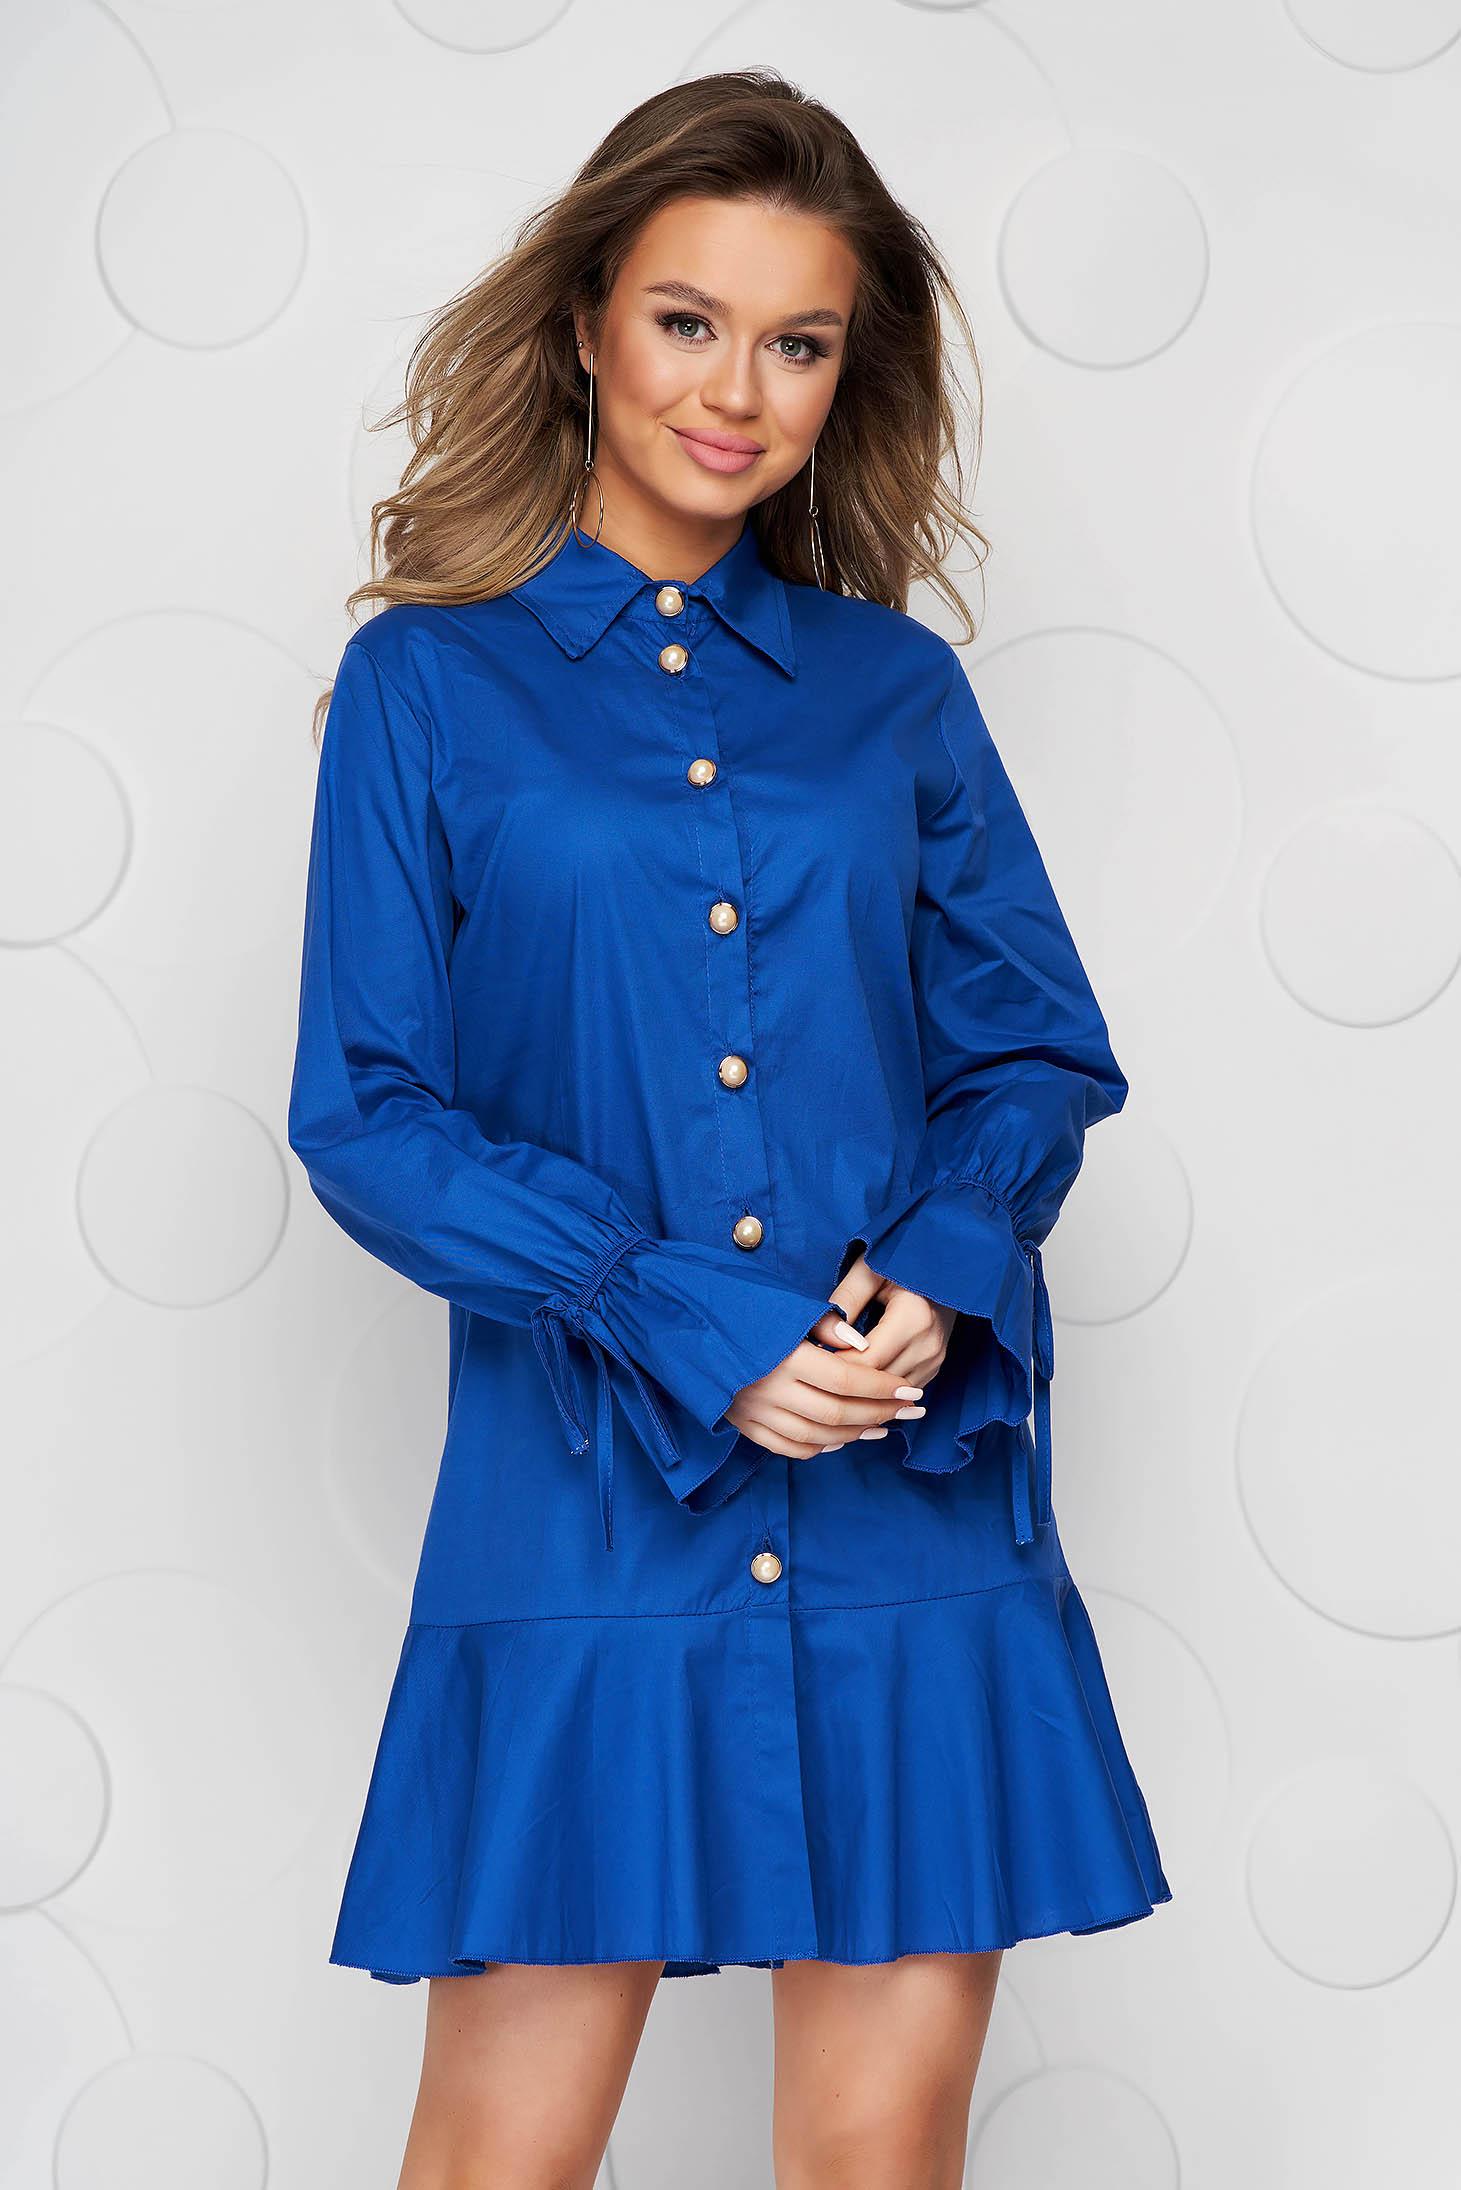 Rochie SunShine tip camasa albastra din material subtire accesorizata cu fundite cu croi larg midi